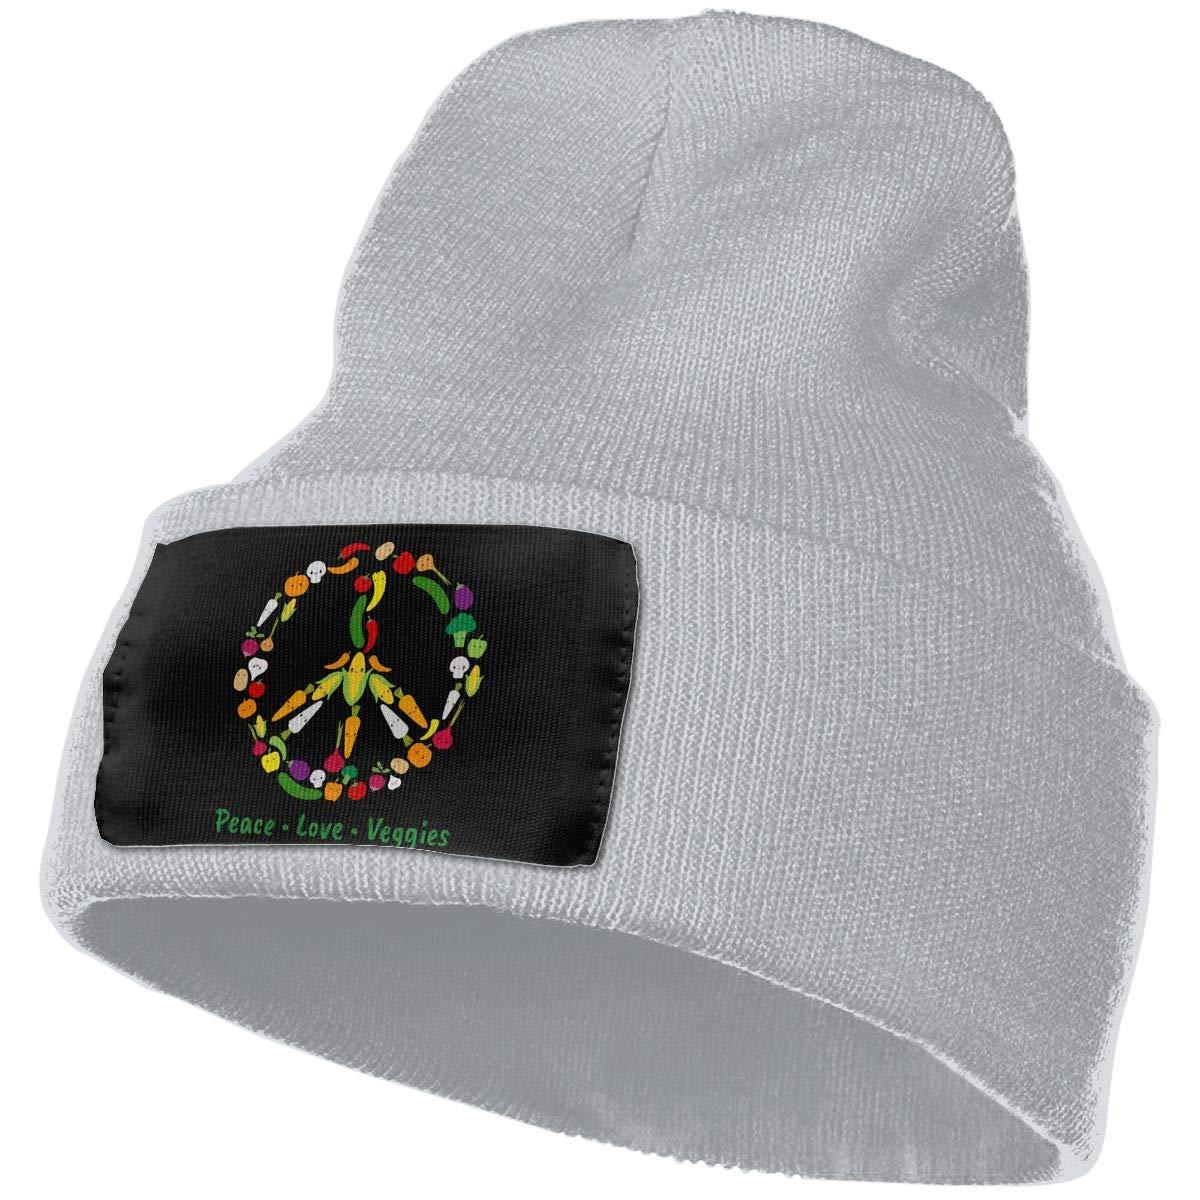 Cute Kawaii Vegetable Veggie Peace Sign Fashion Skull Beanie WHOO93@Y Mens Womens 100/% Acrylic Knitting Hat Cap